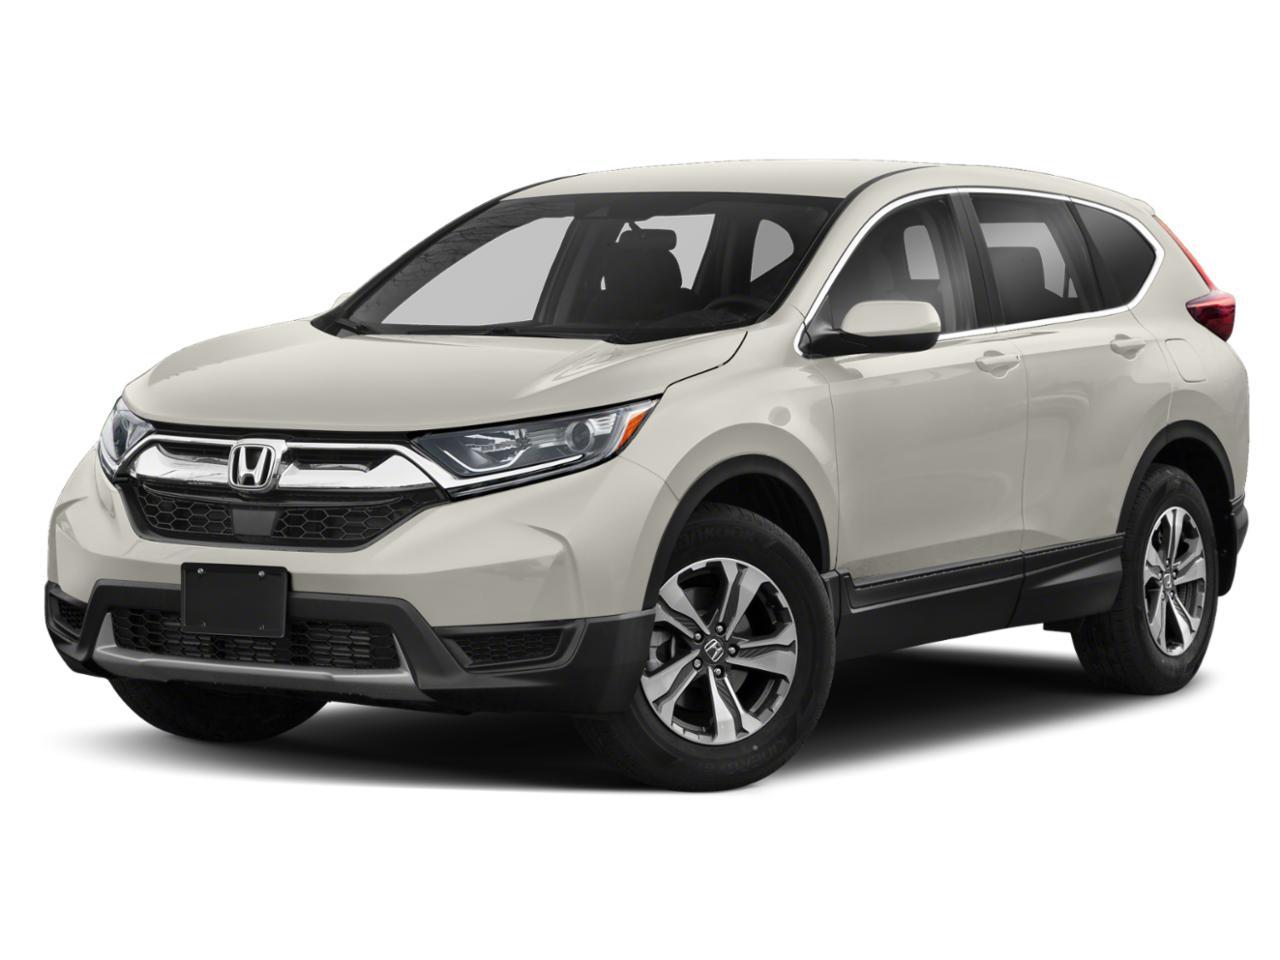 2019 Honda CR-V Vehicle Photo in Pittsburg, CA 94565